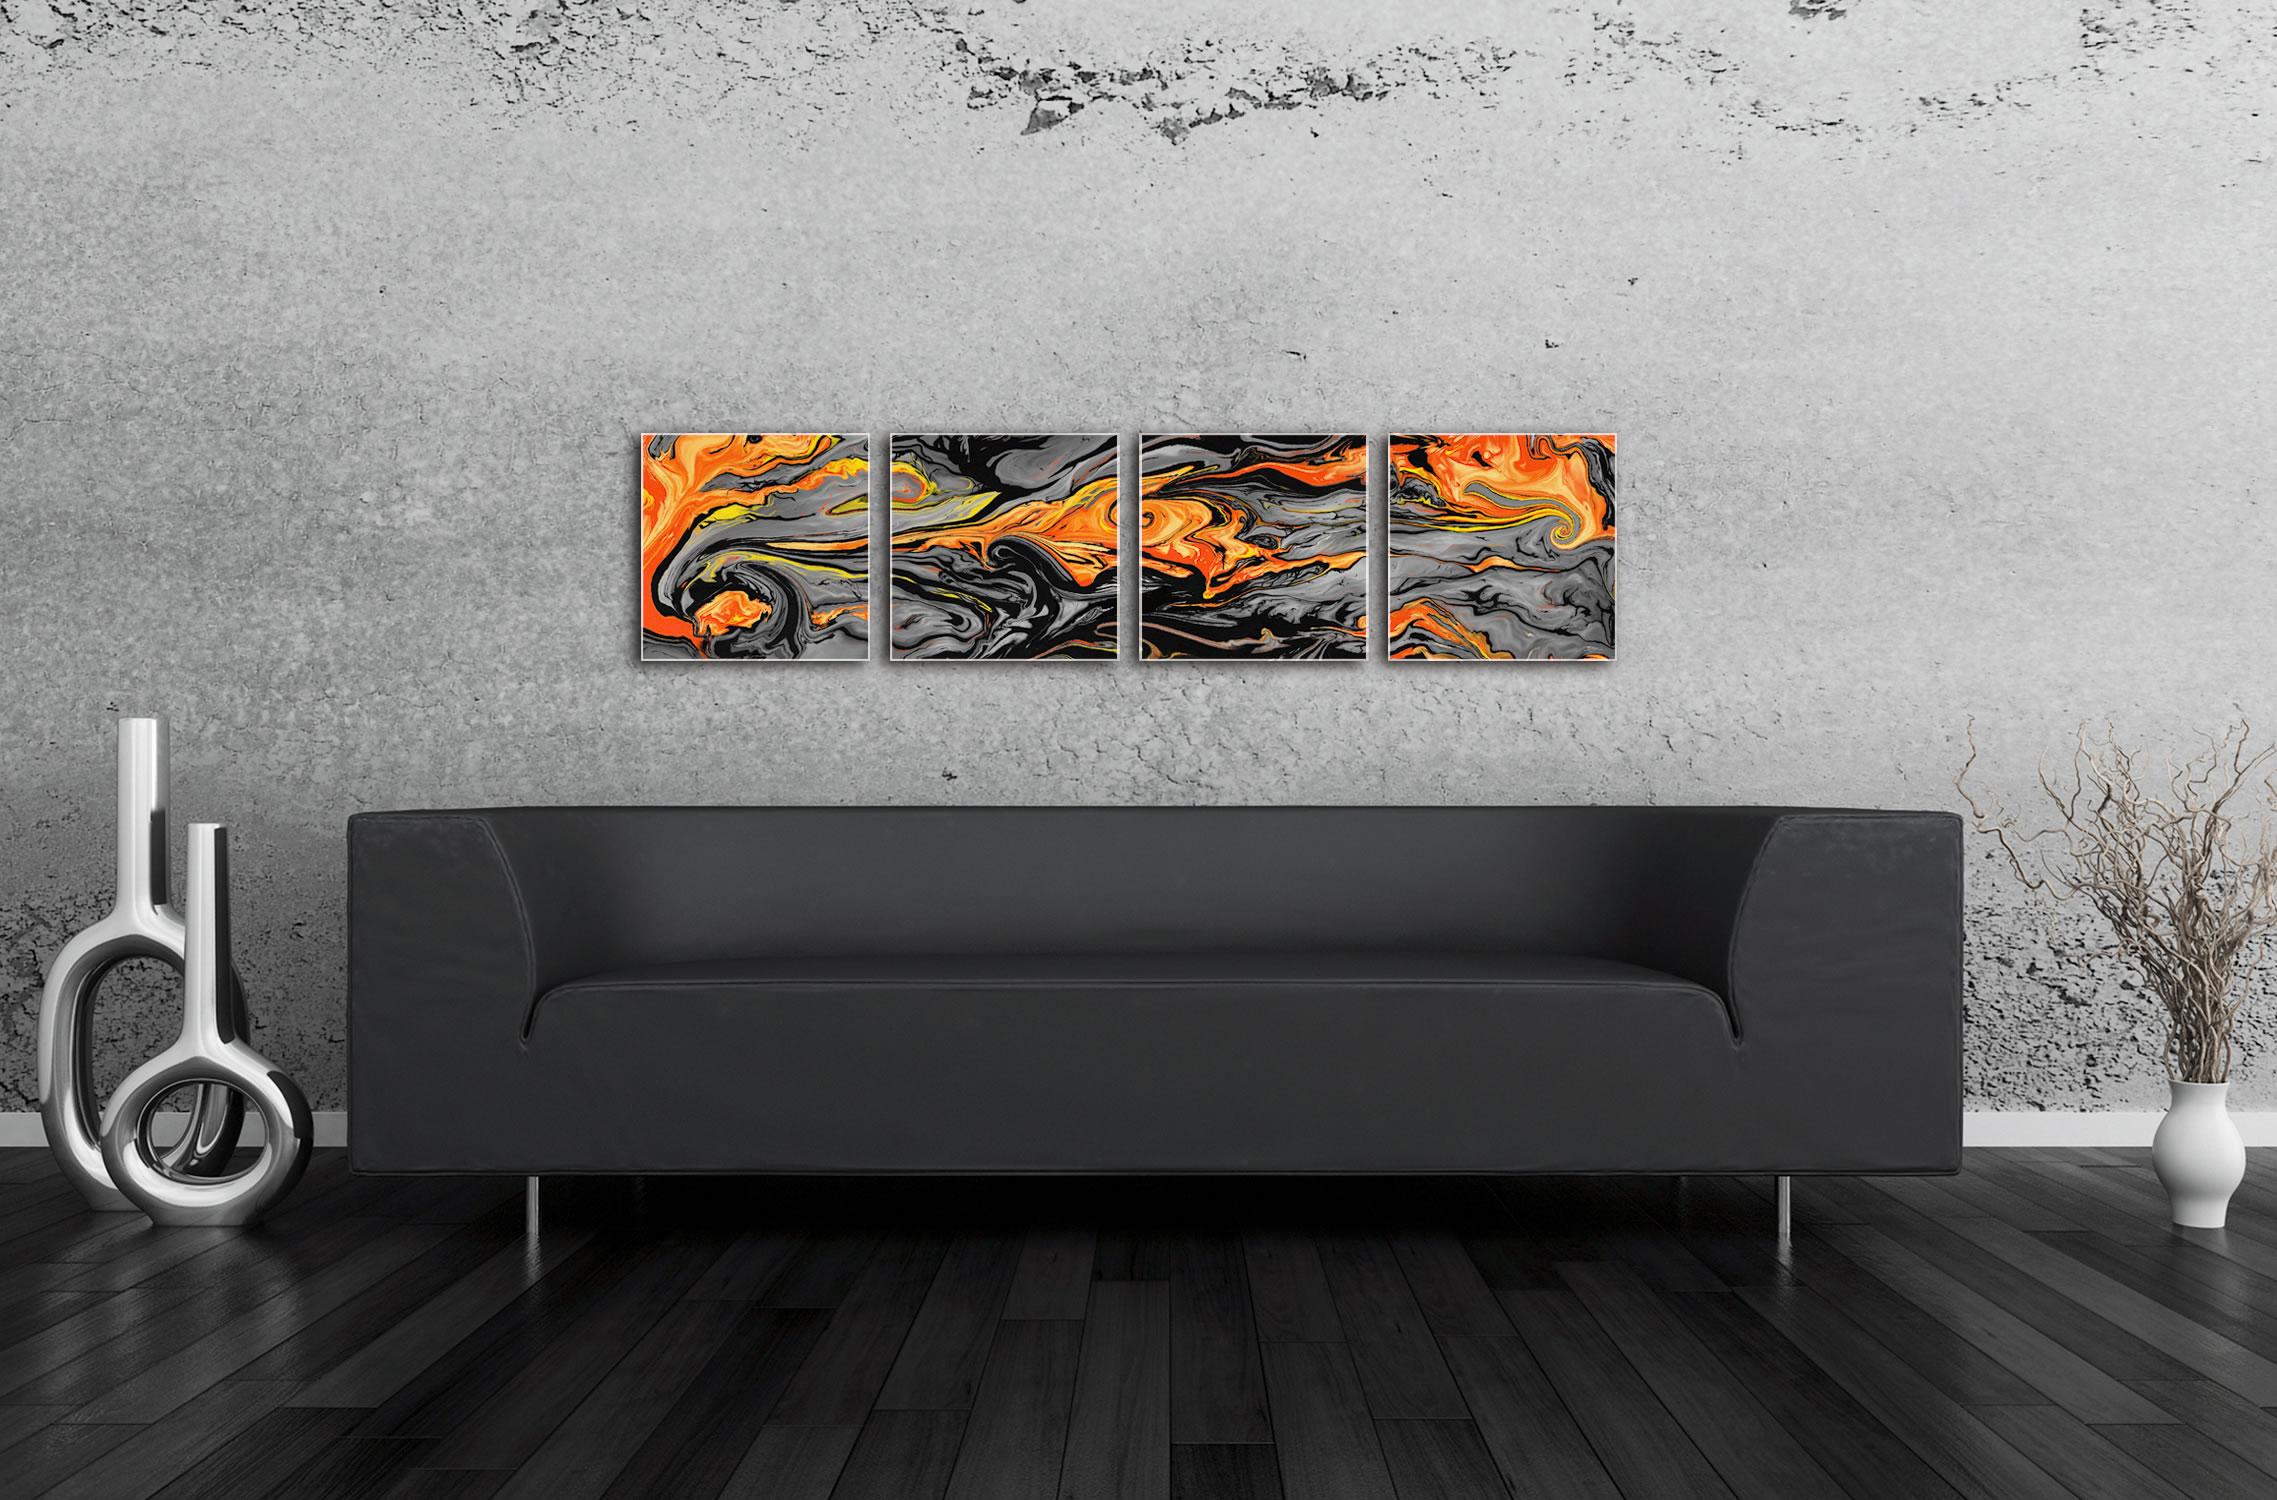 Lava Orange - Reverse-Print Acrylic Abstract Art - Lifestyle Image